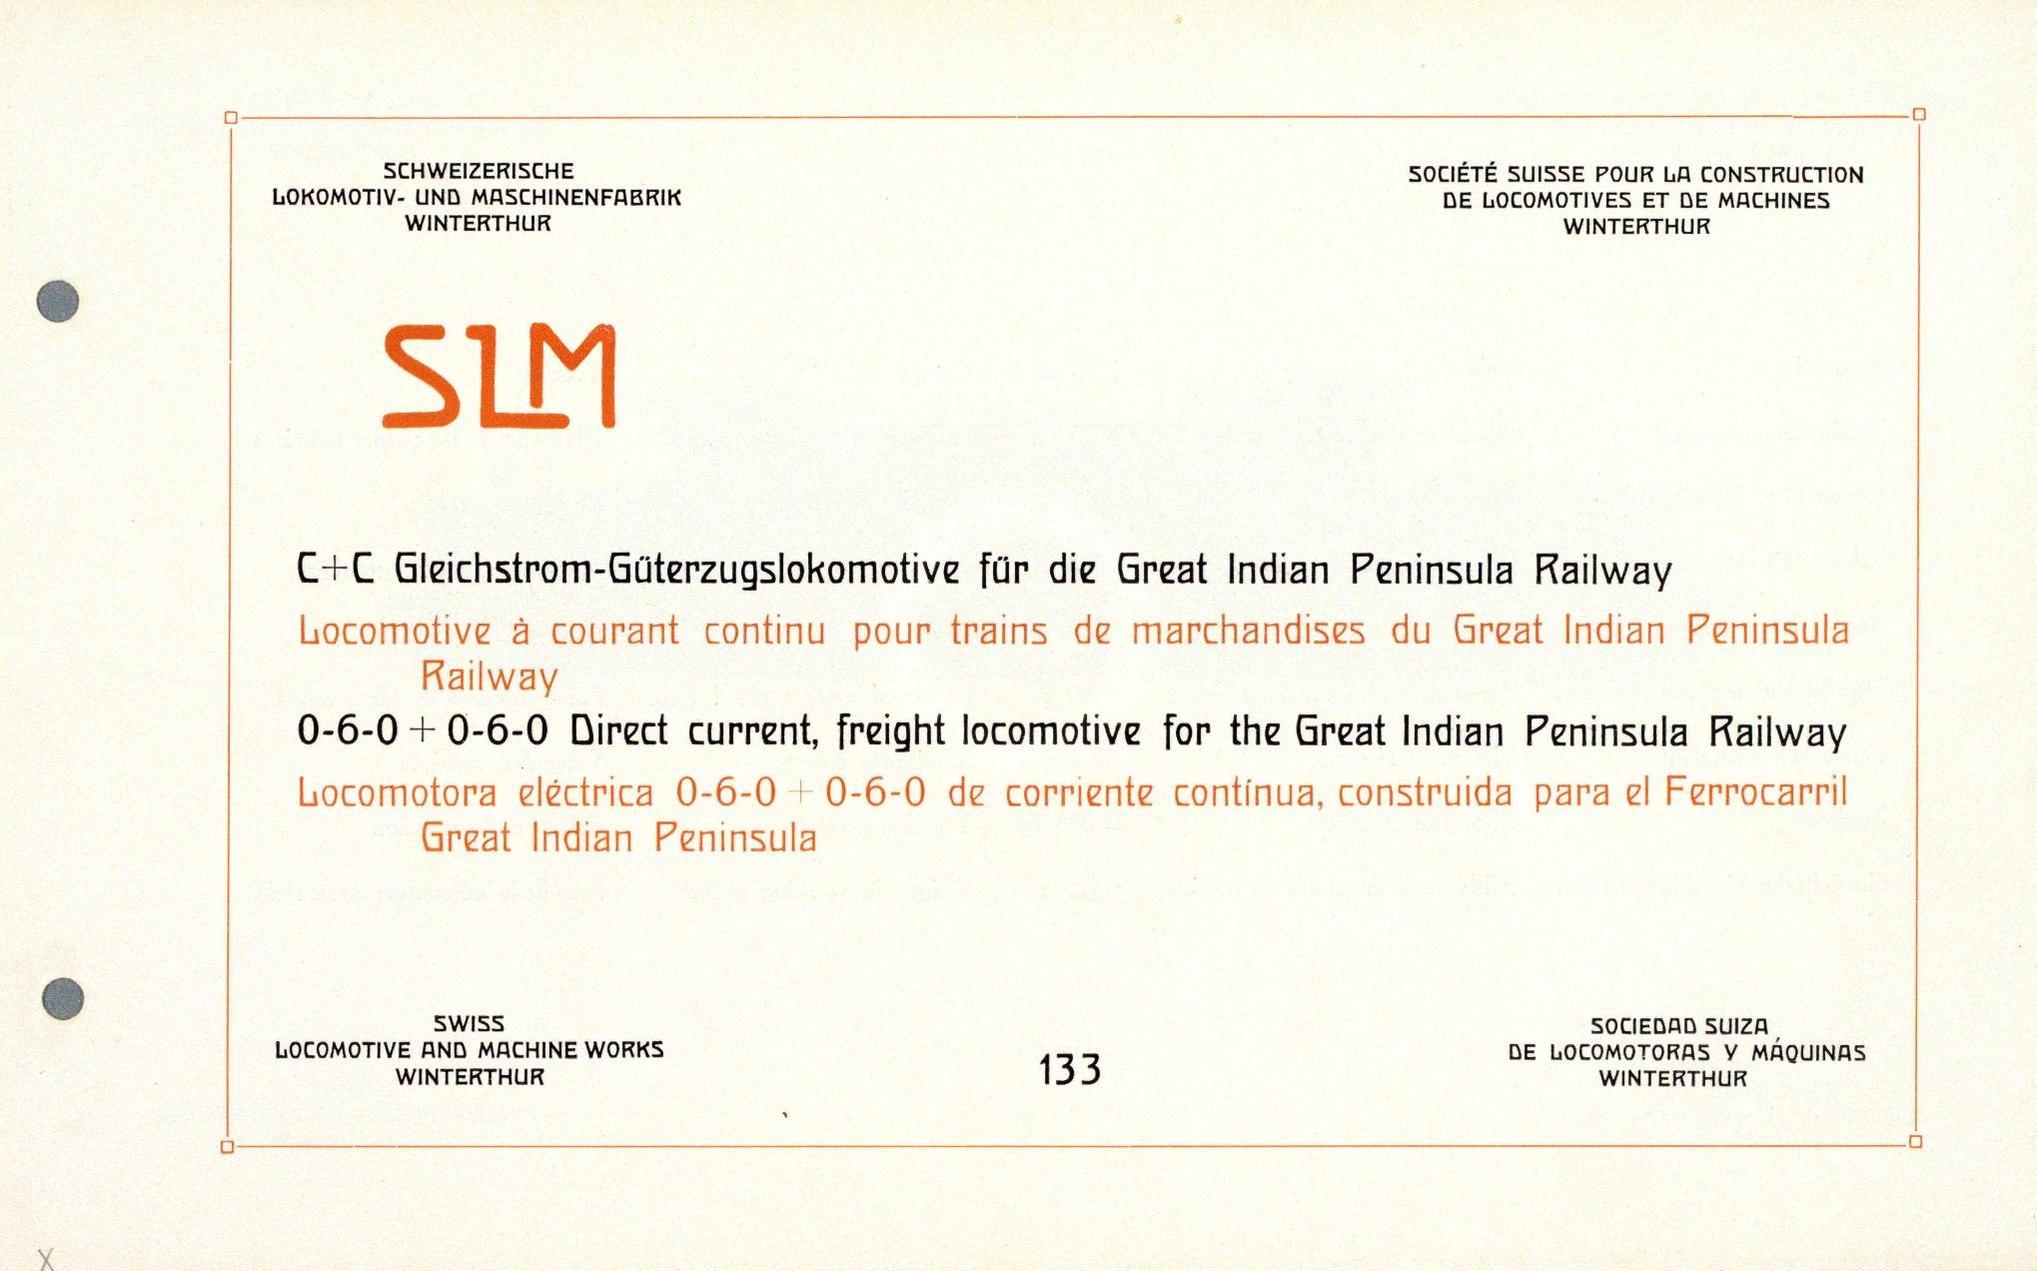 Filesbb Historic 133 Cc Gleichstrom Gterzugslokomotive Fr